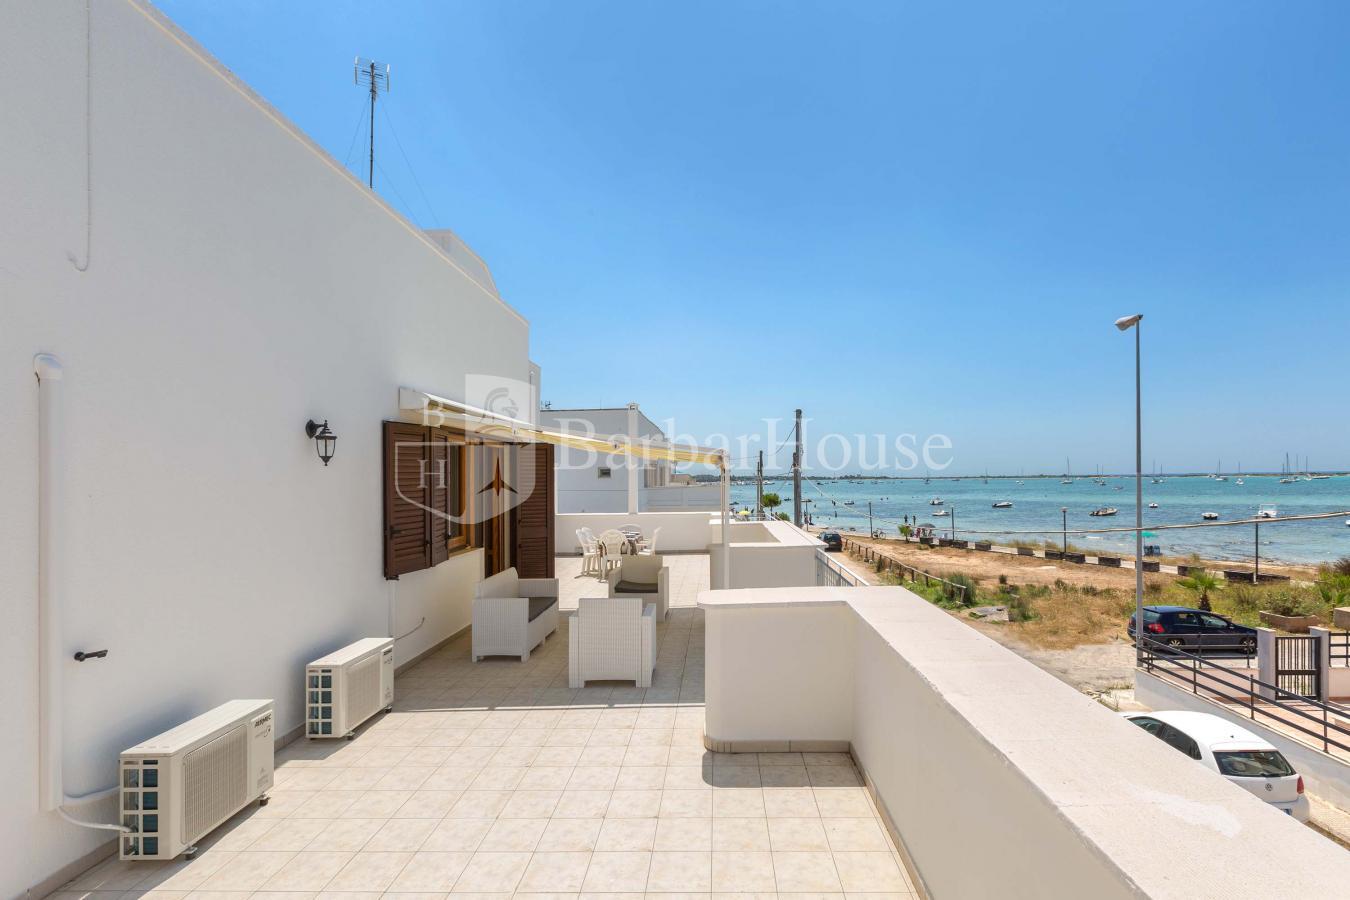 Appartements de vacances - Porto Cesareo - Appartamento Orizzonte